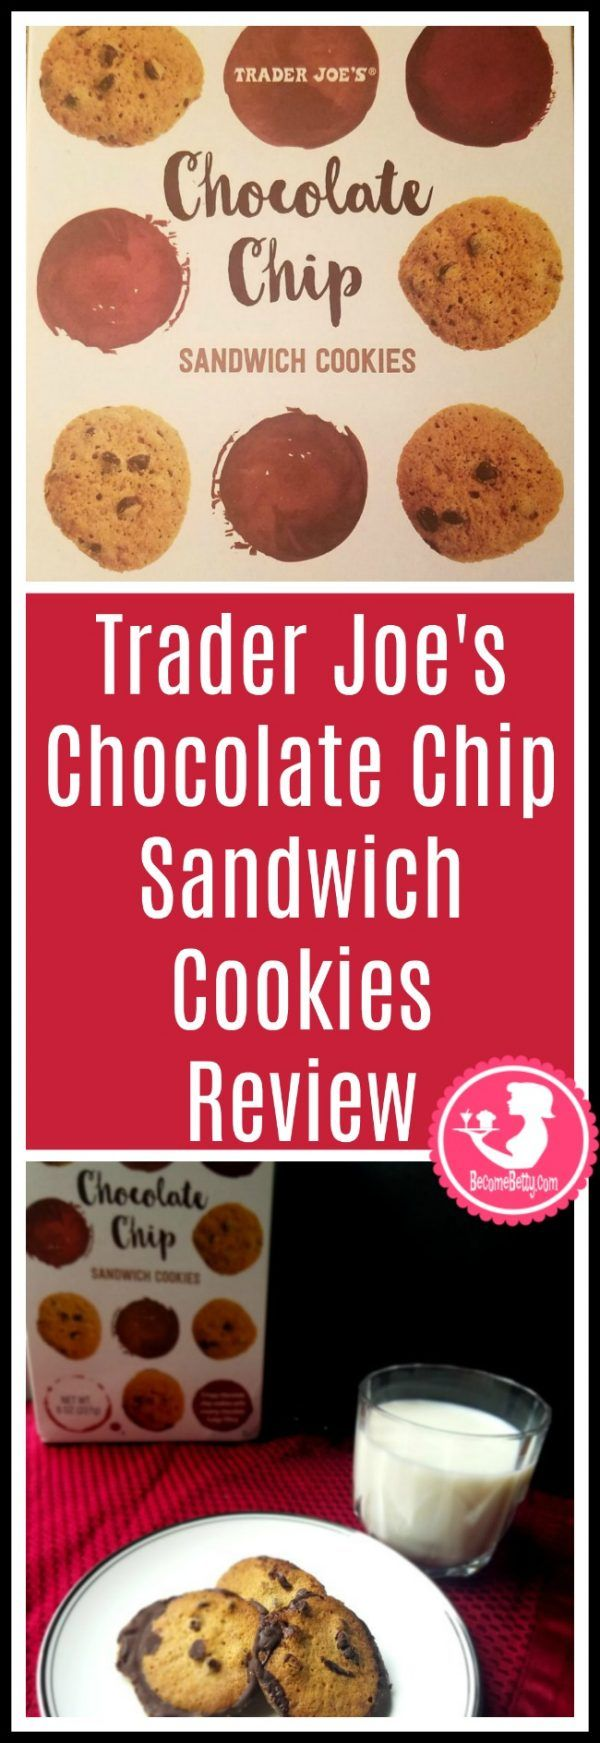 75 best Trader Joe's Chocolate images on Pinterest   Trader joes ...